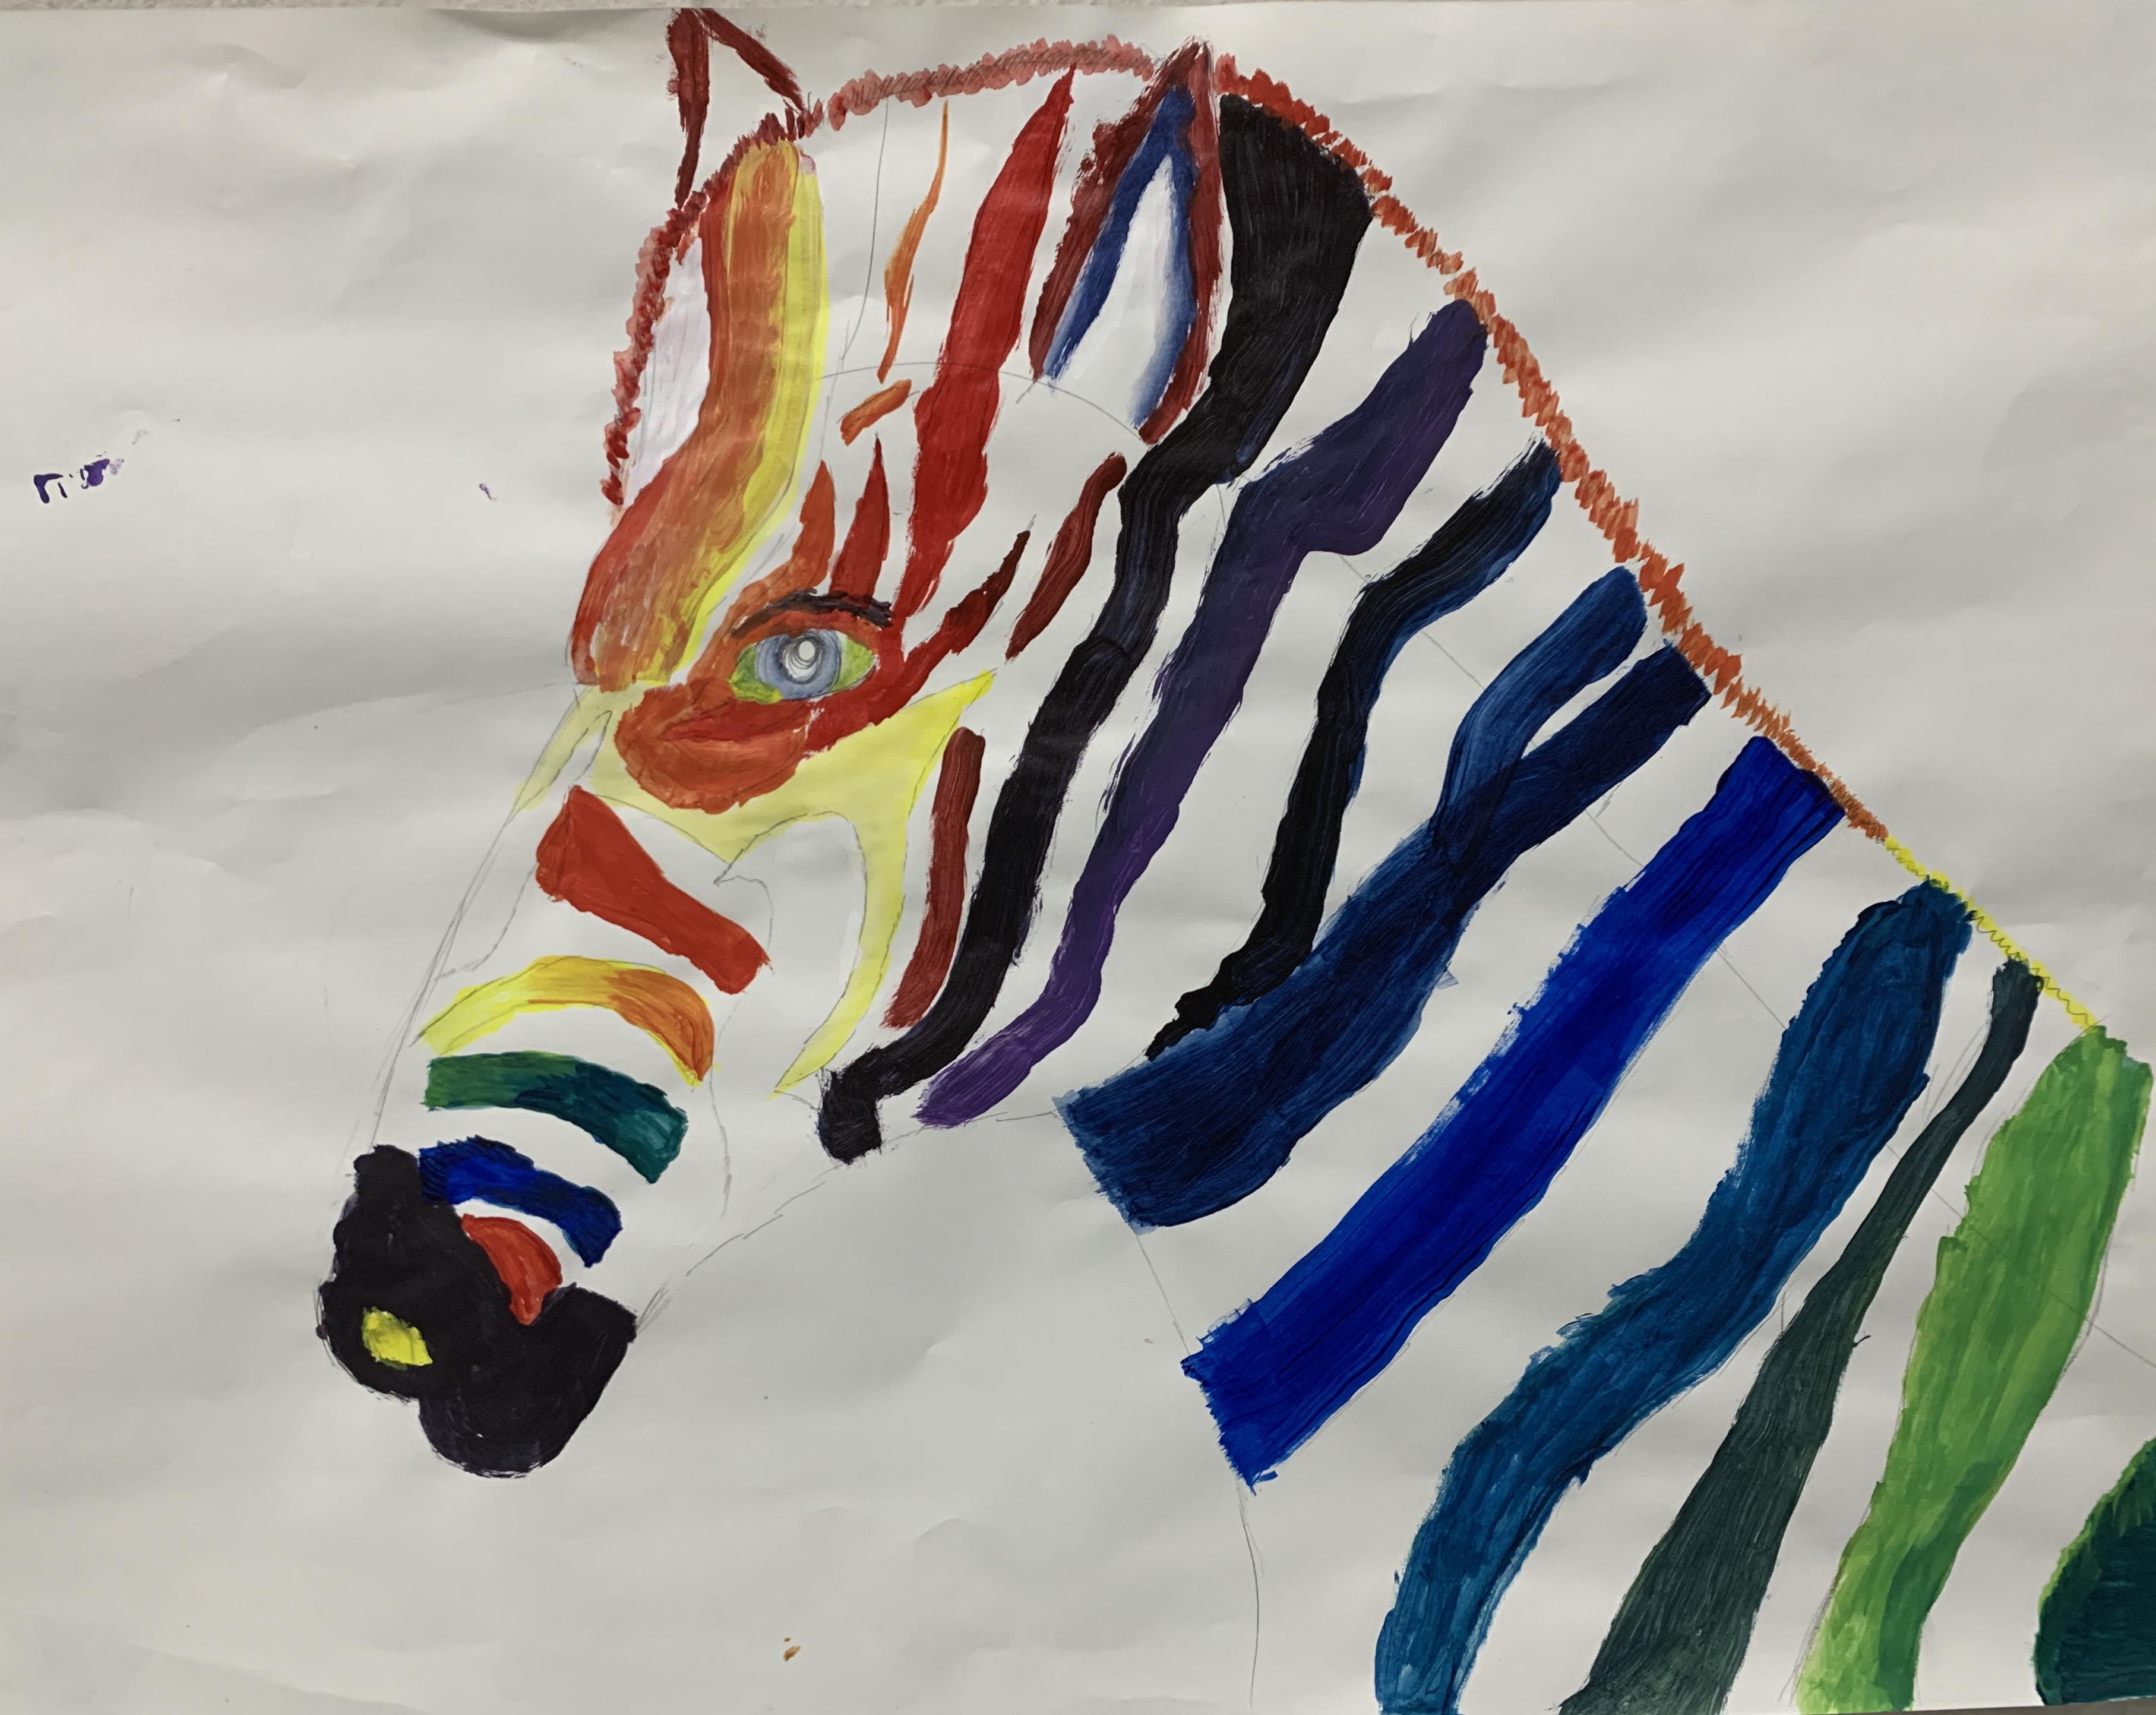 Students color wheel project - zebra